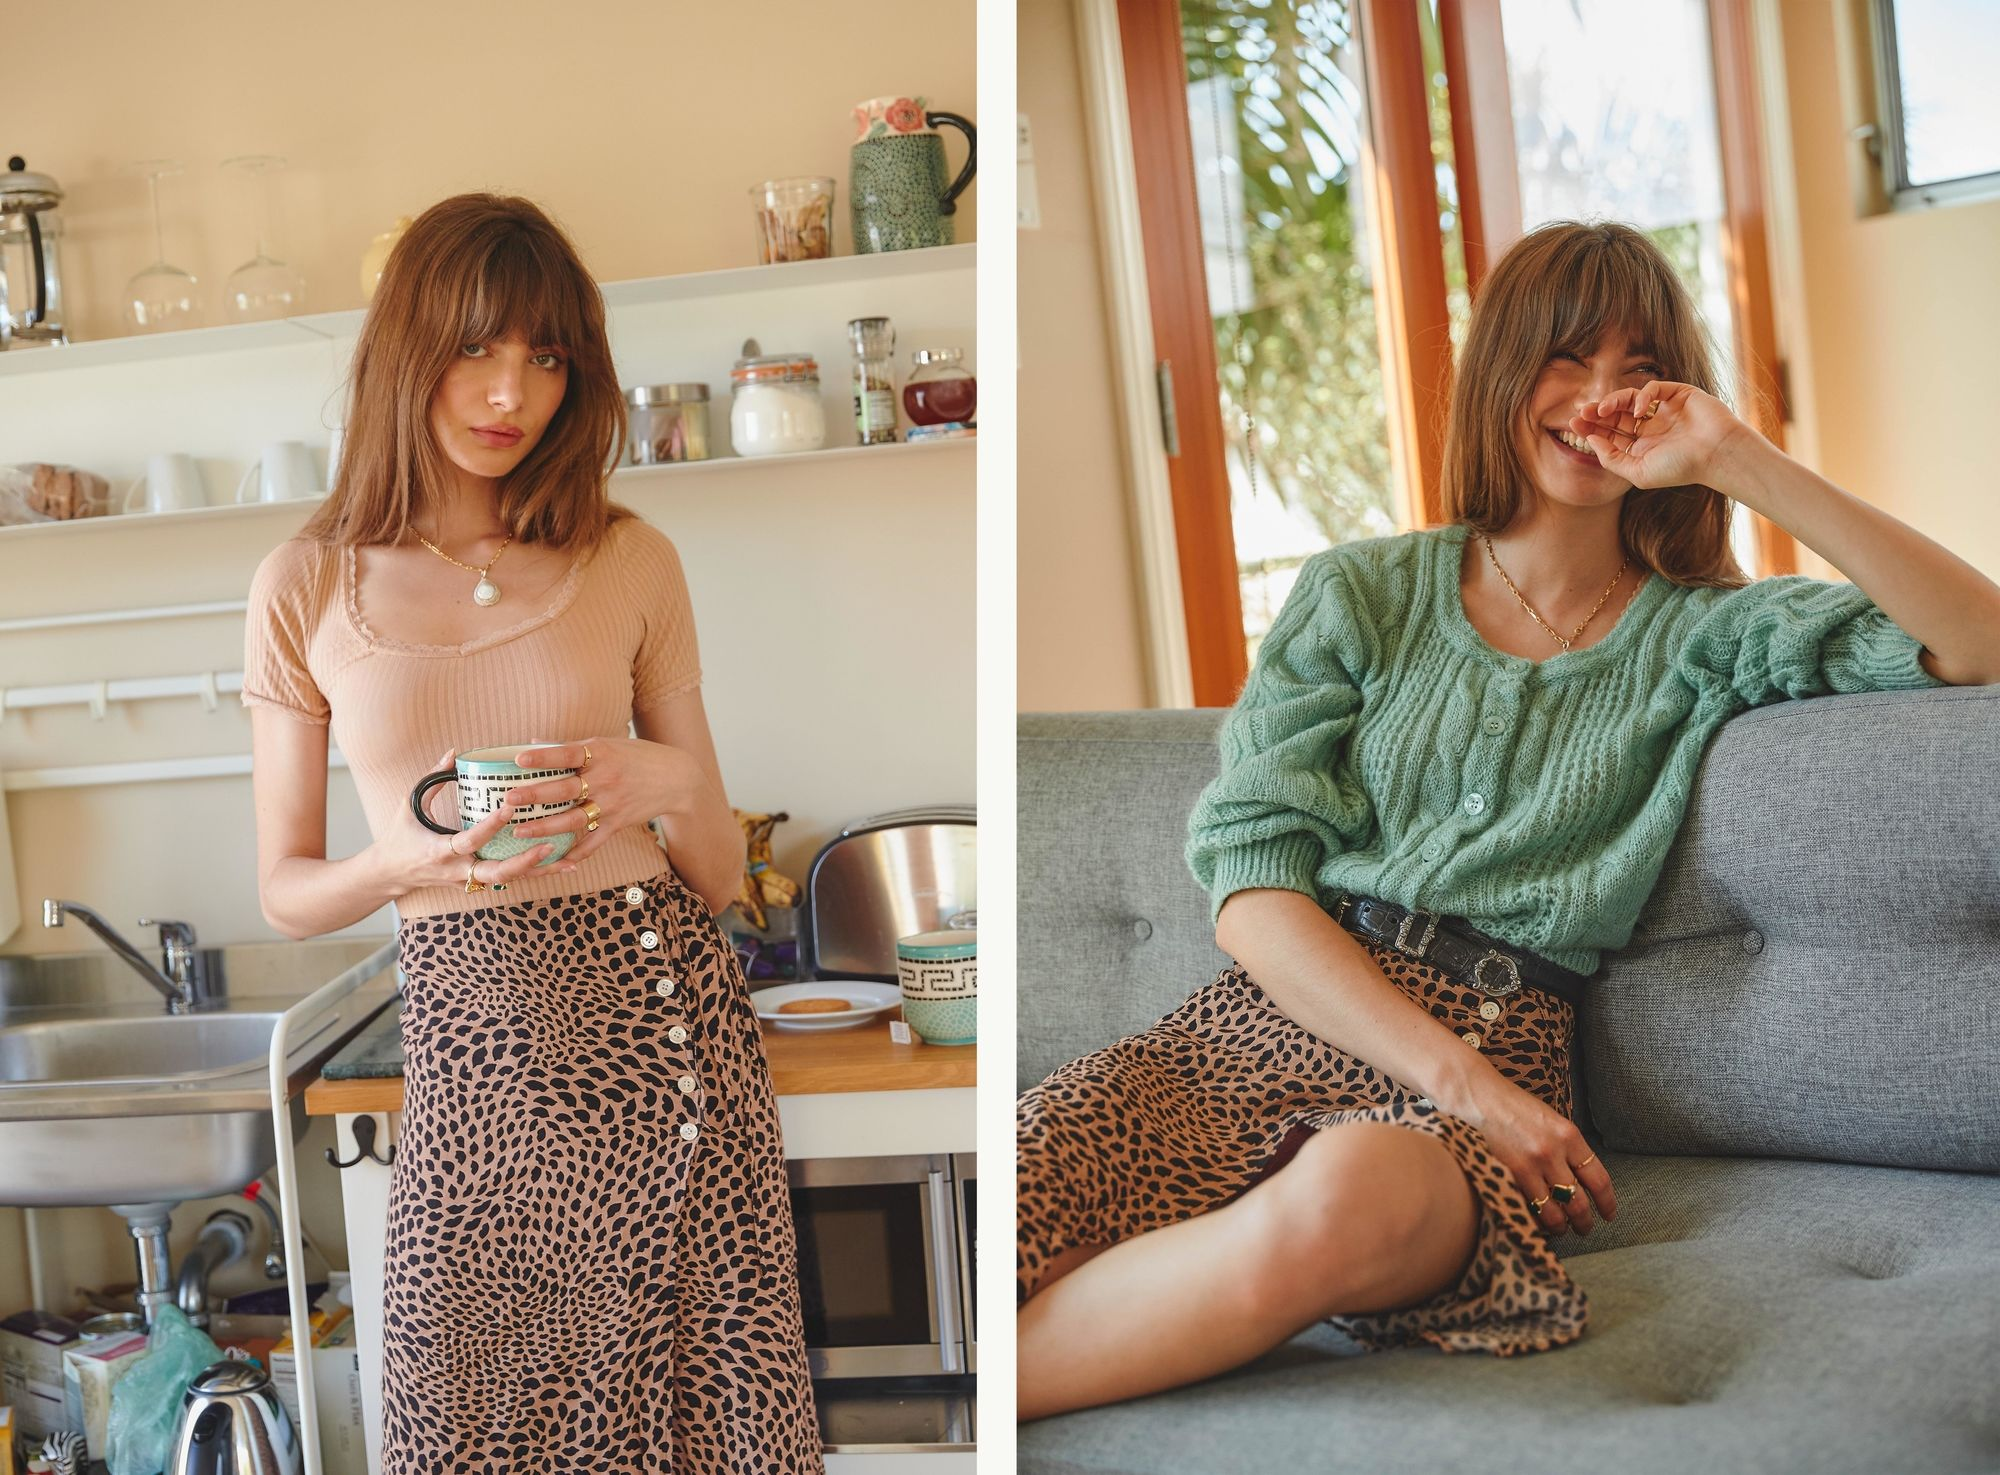 ALYSSA PIZER MANAGEMENT: At Home With Mara LaFontan By Vivian Kim